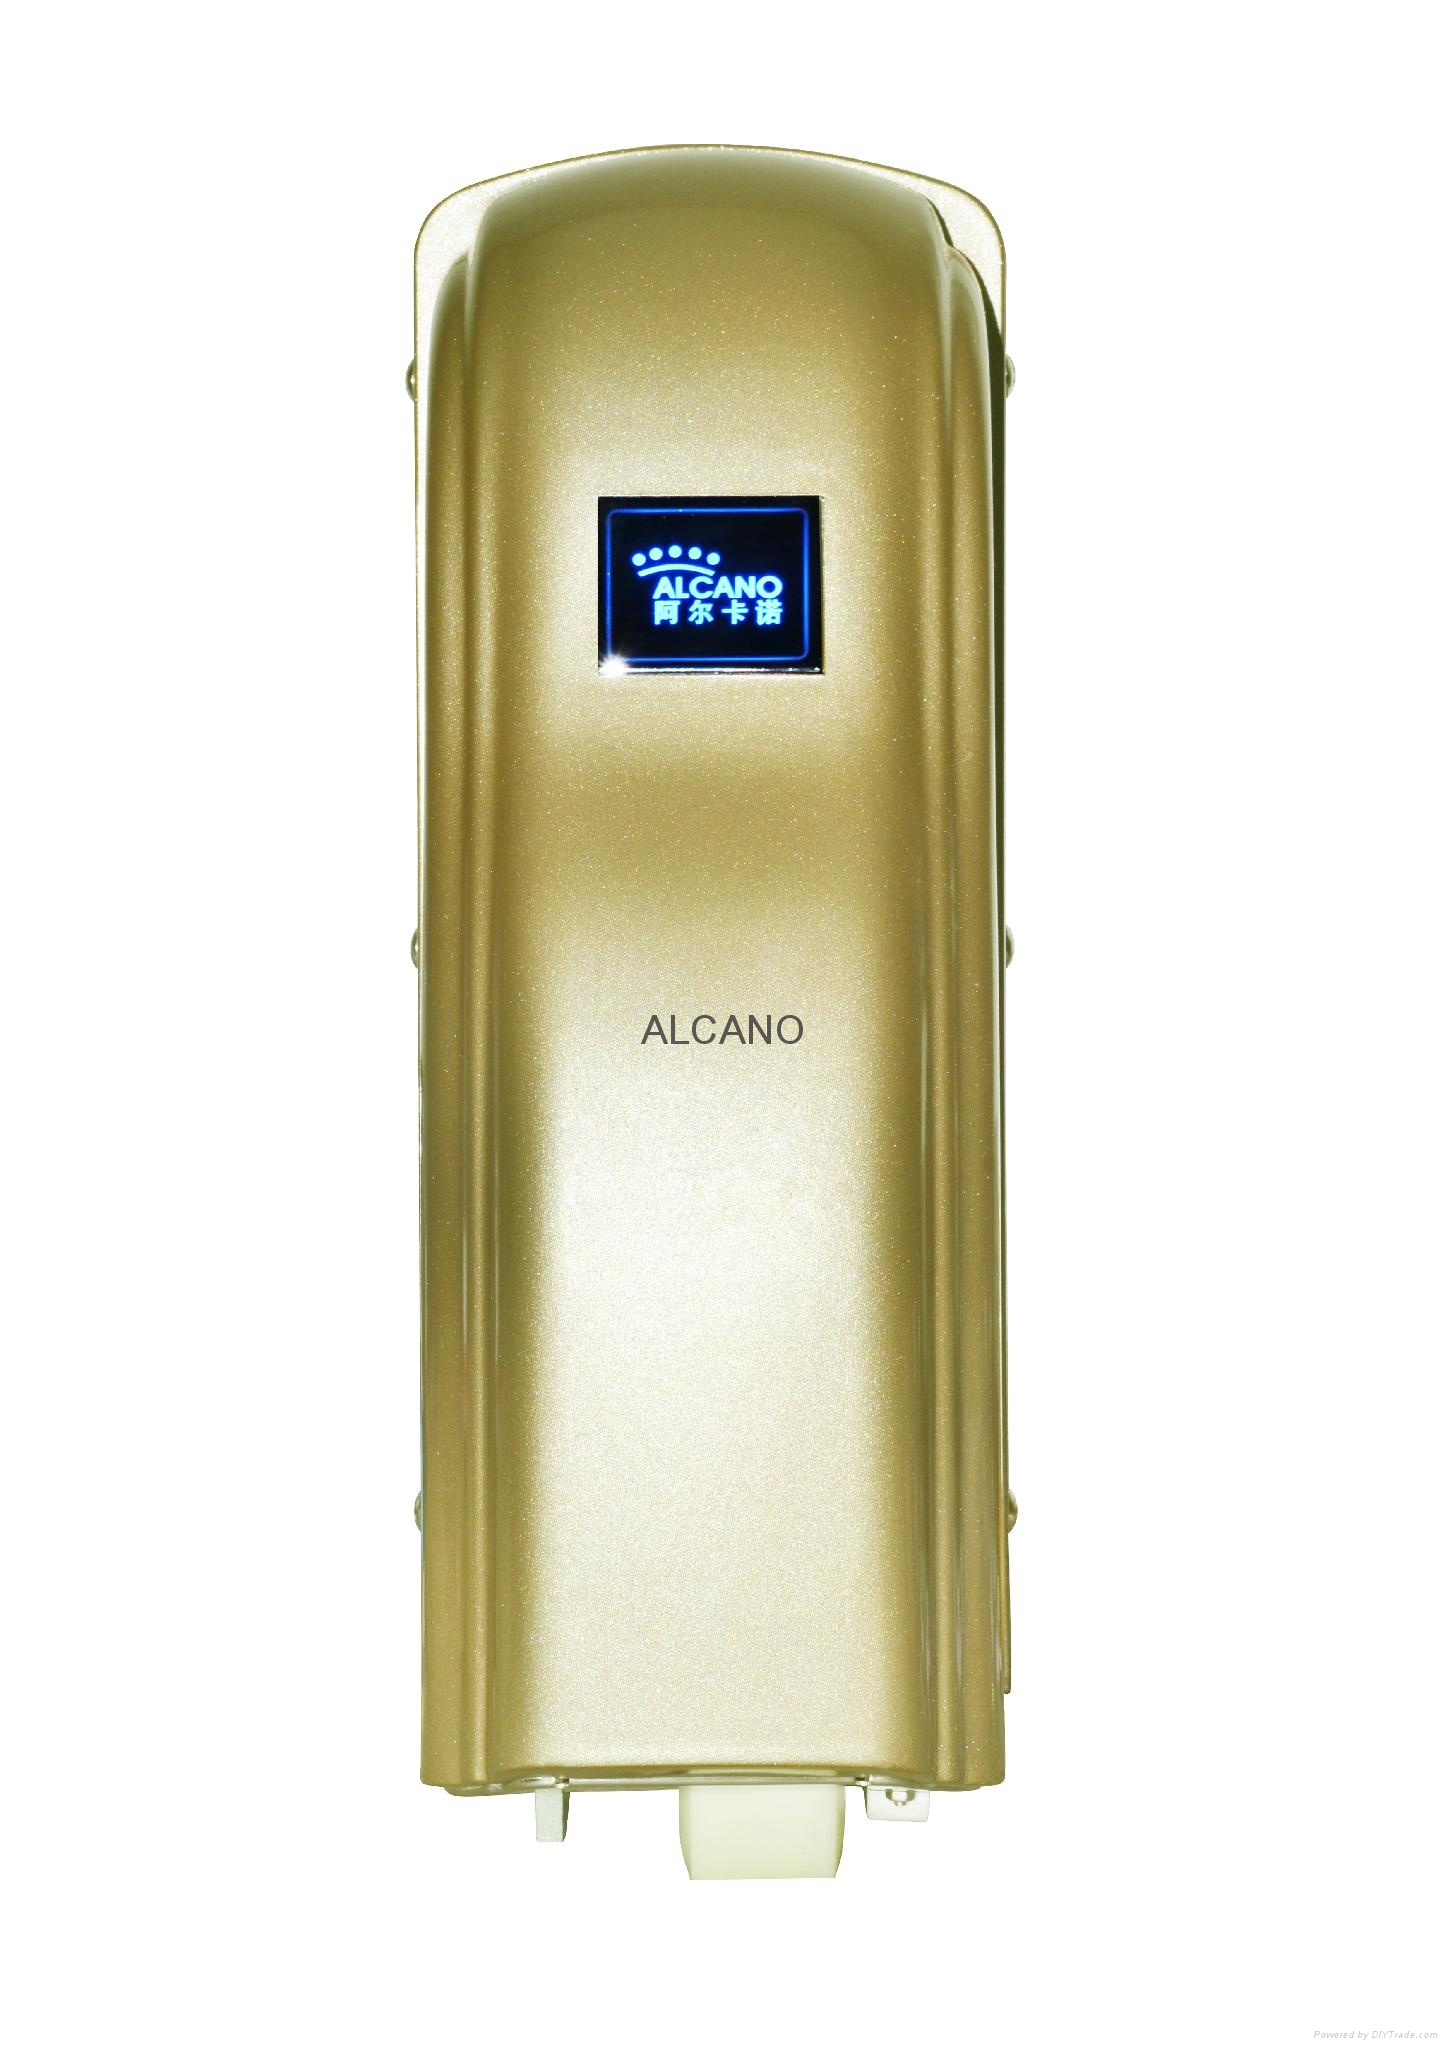 Alcano swing gate opener manufacturer 4